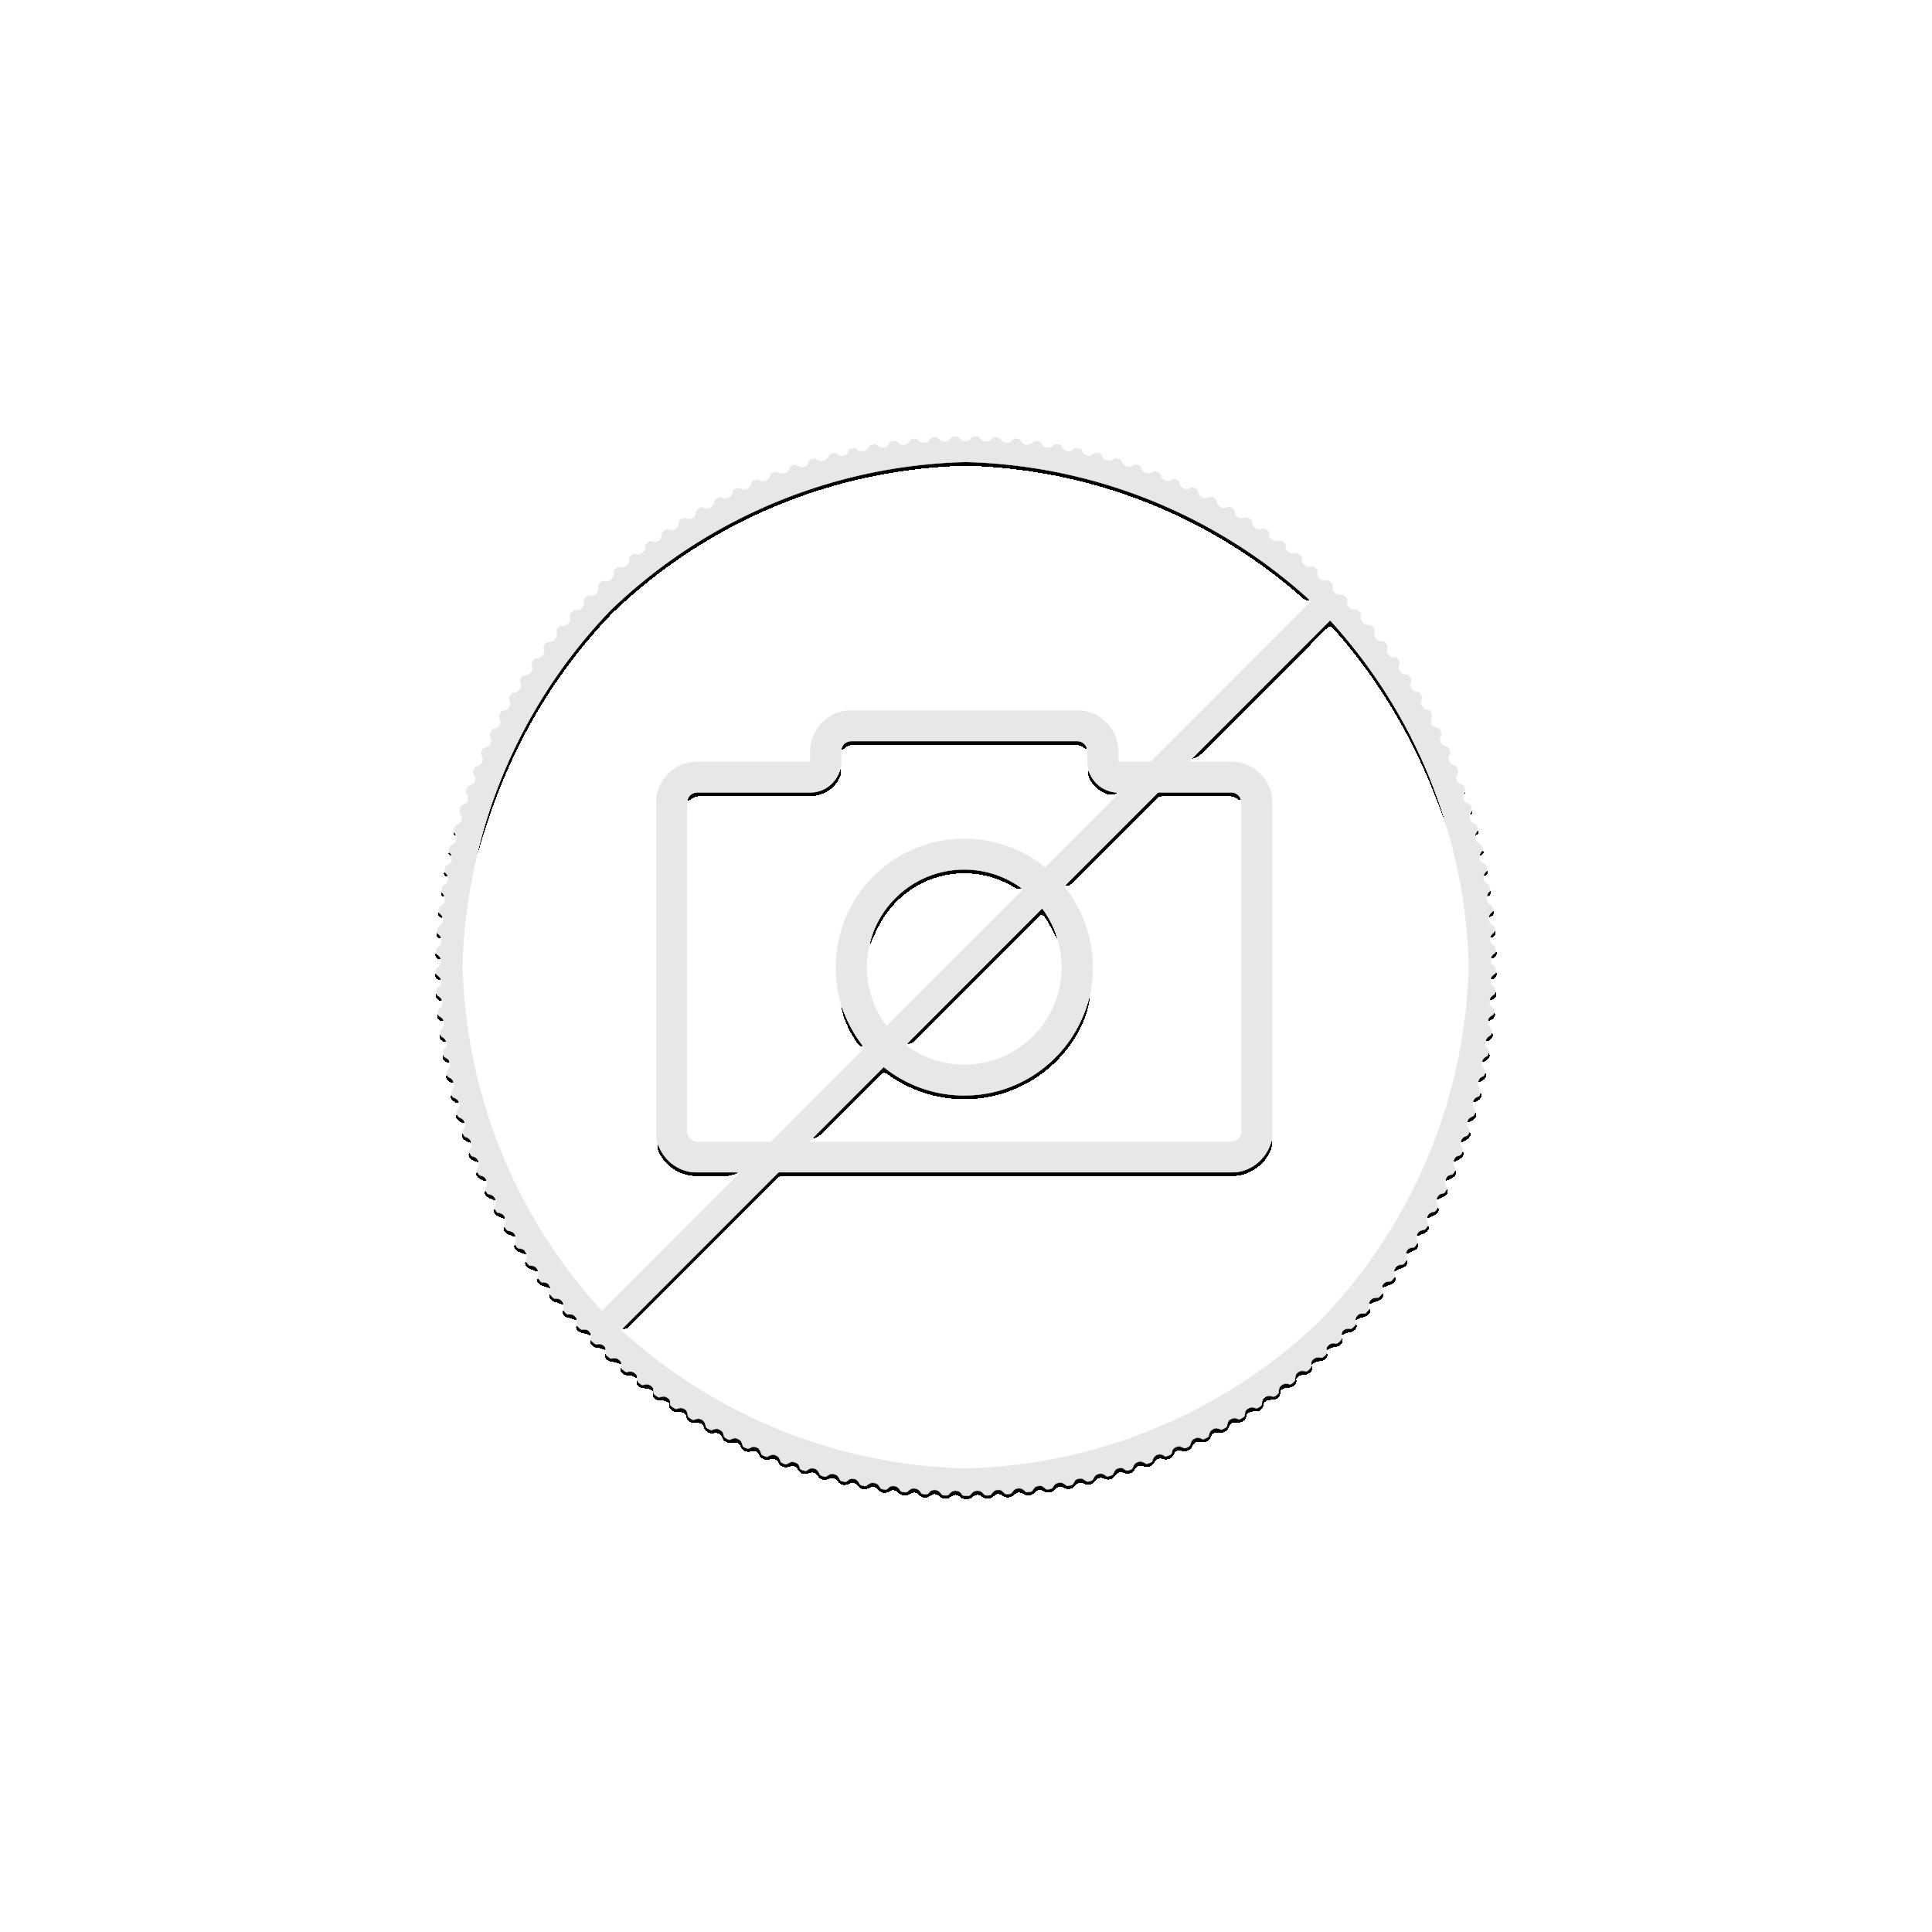 25x 1 gram gouden munt Maple Leaf 2021